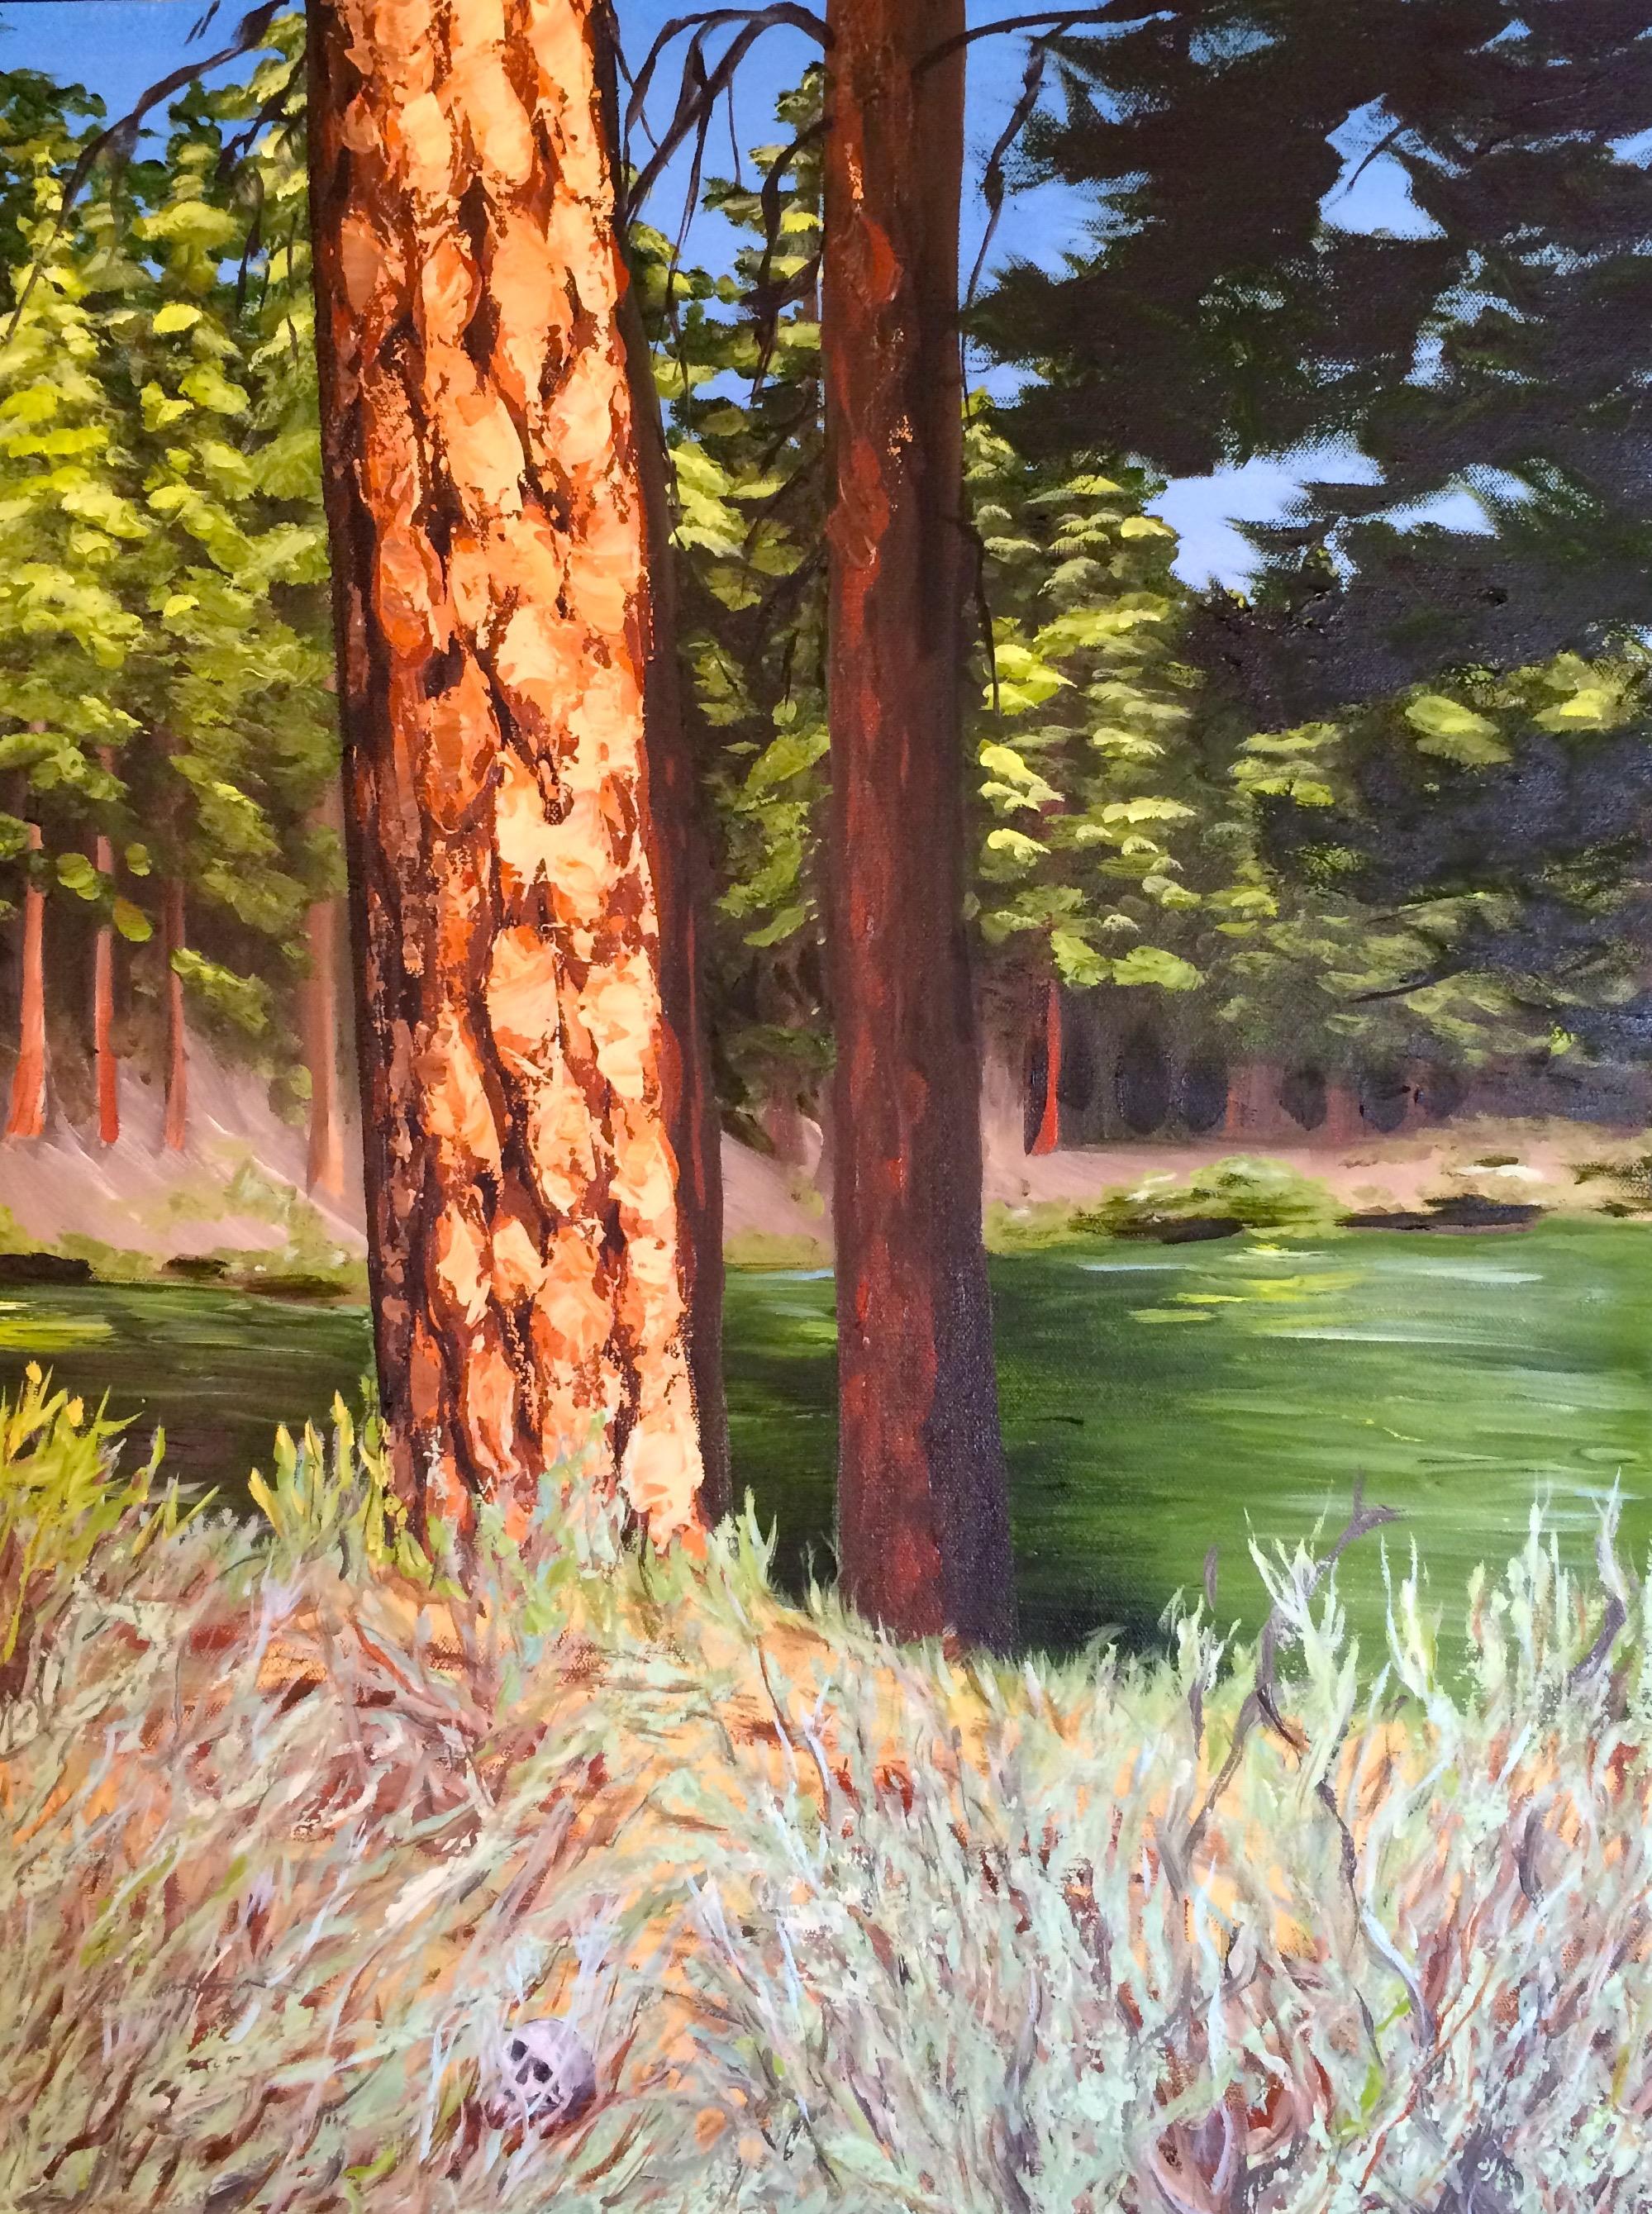 Ponderosa pine bark study. Oil on canvas (brush and pallet knife application). 18 x 24. 2014.